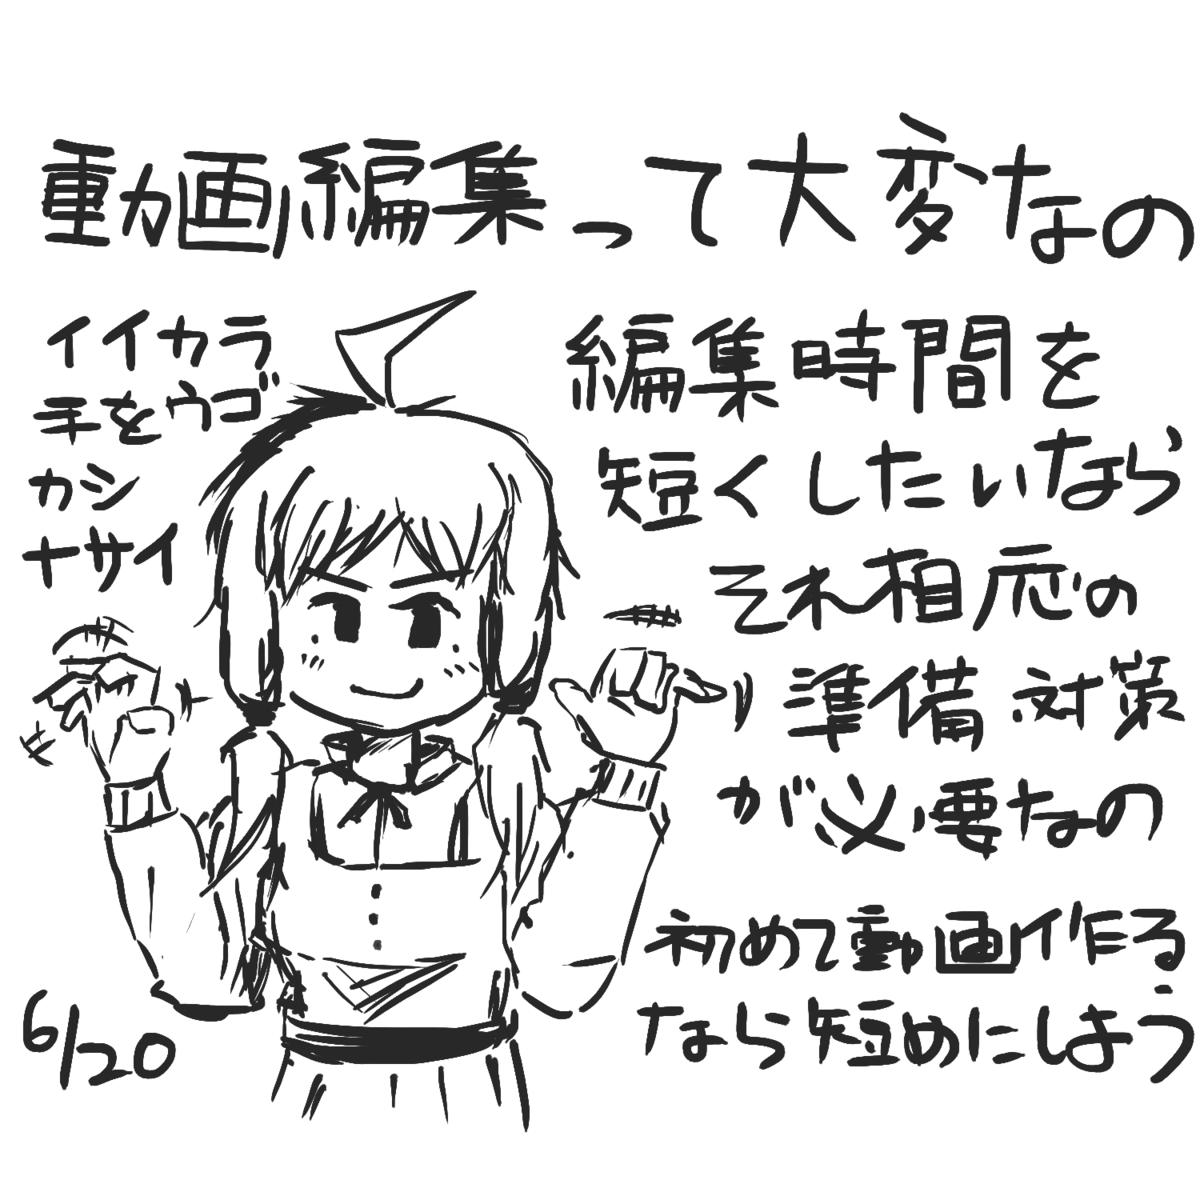 f:id:zomuzomu:20210620094032p:plain